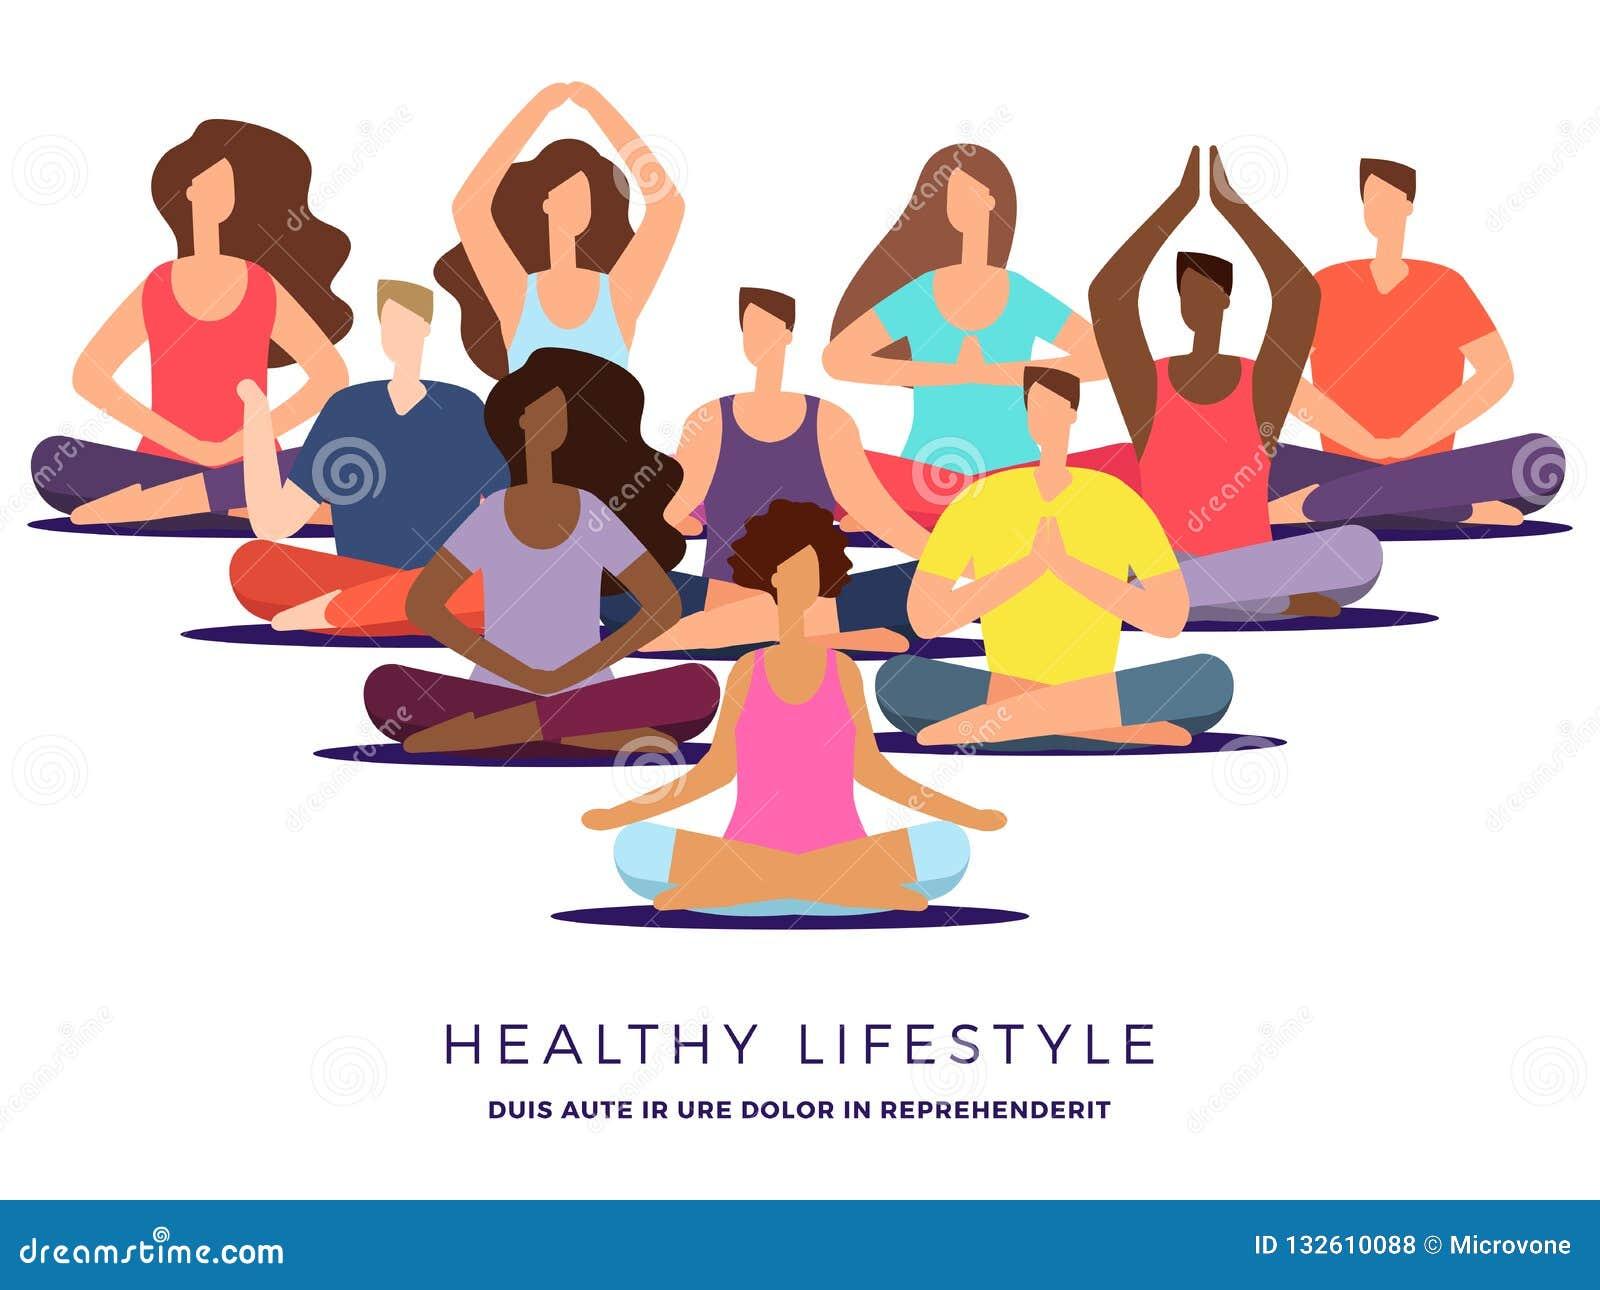 Yoga Or Pilates Class Vector Illustration Meditation Woman And Man Stock Vector Illustration Of Concept Position 132610088